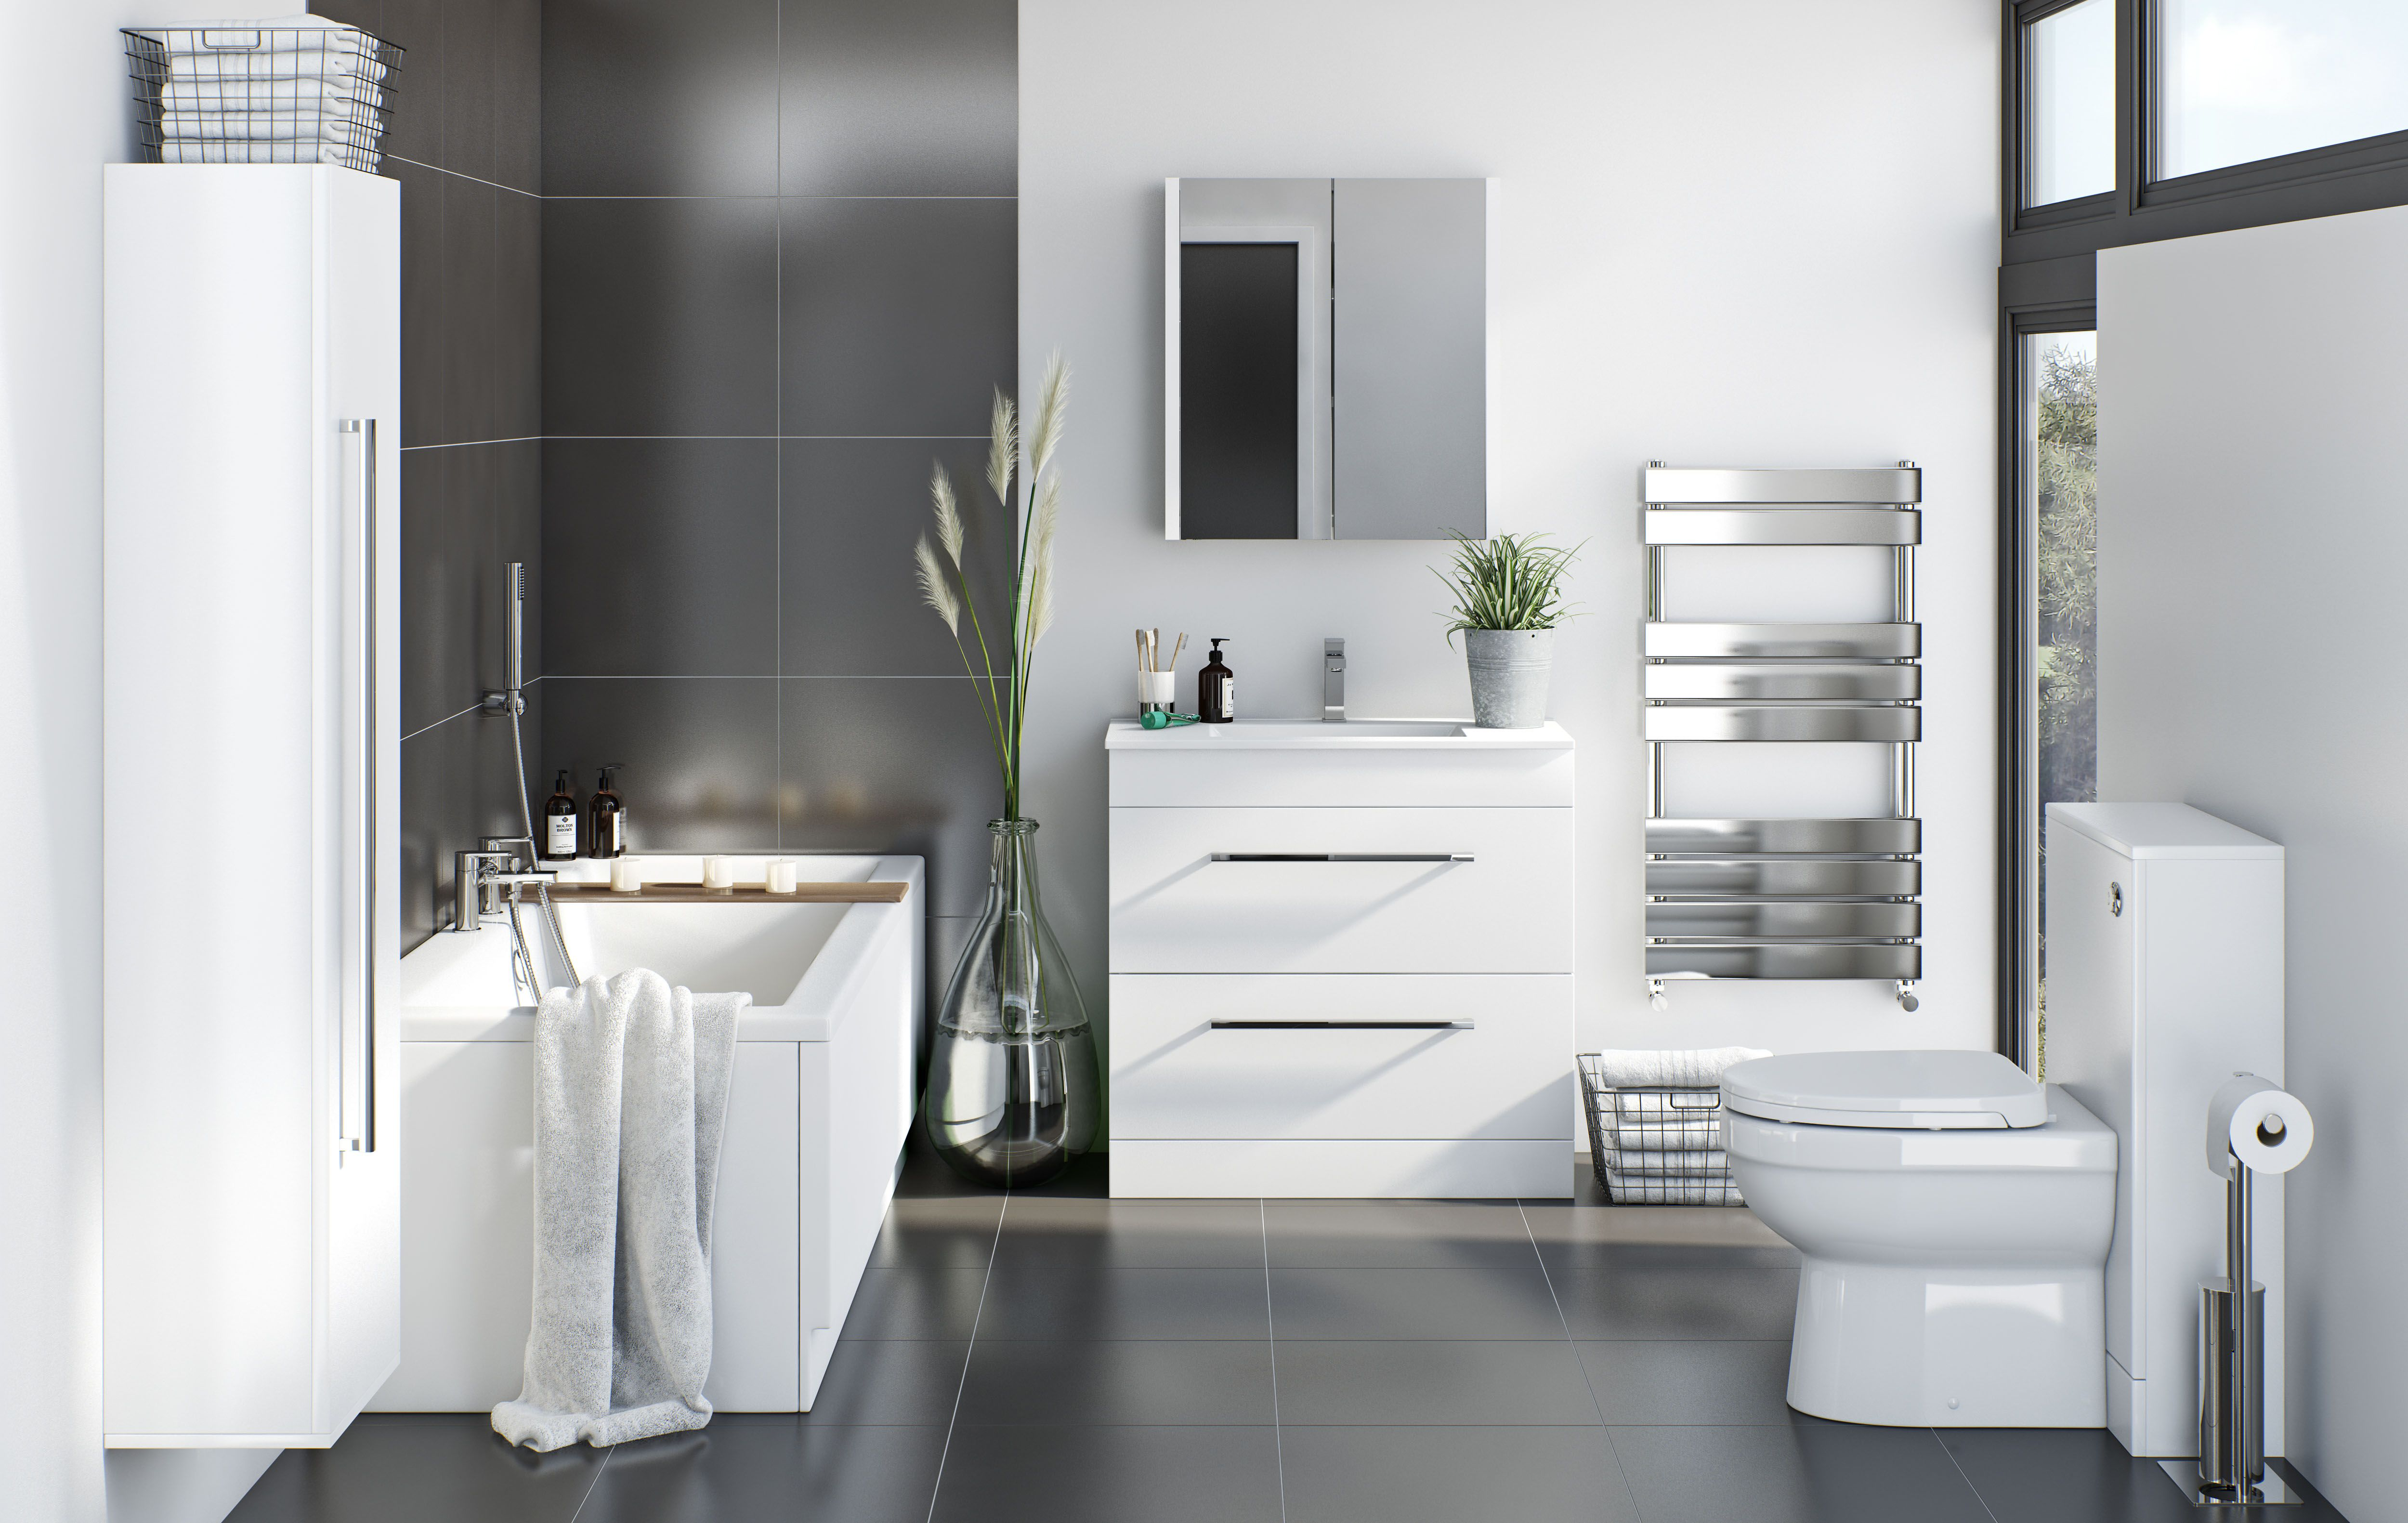 Storage has never been so stylish. The Chamonix bathroom furniture ...